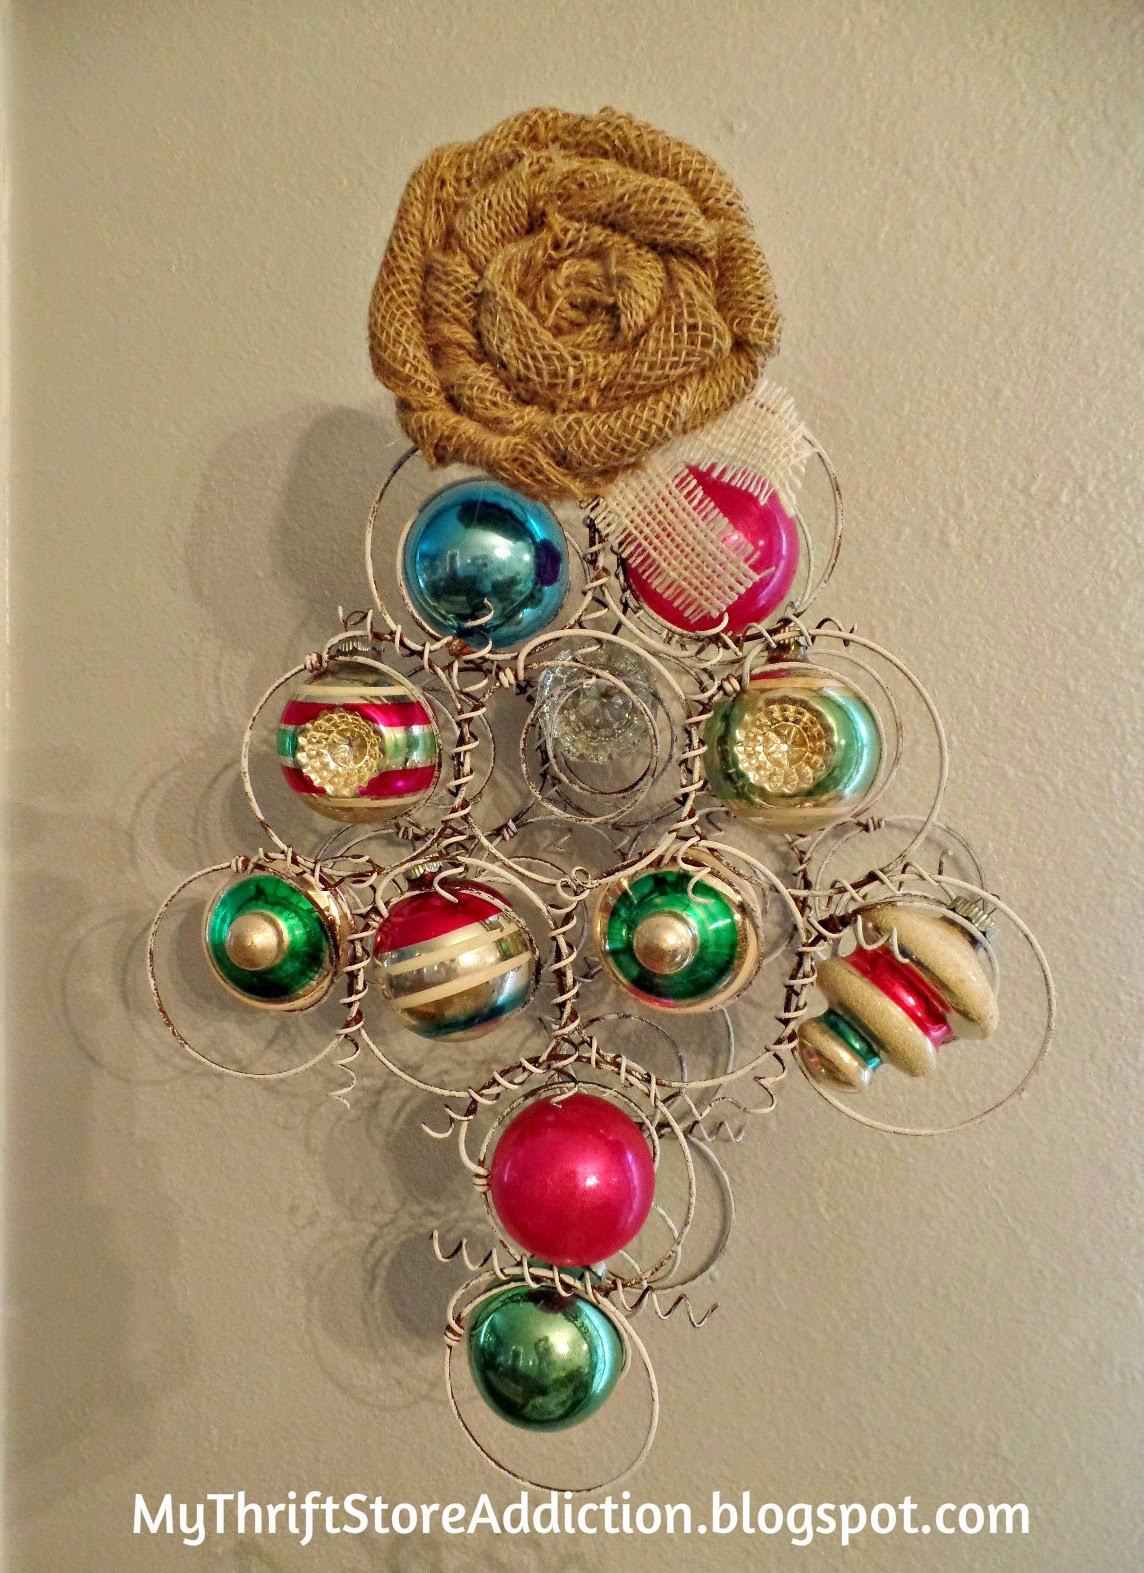 Repurposed bedspring and vintage ornament tree